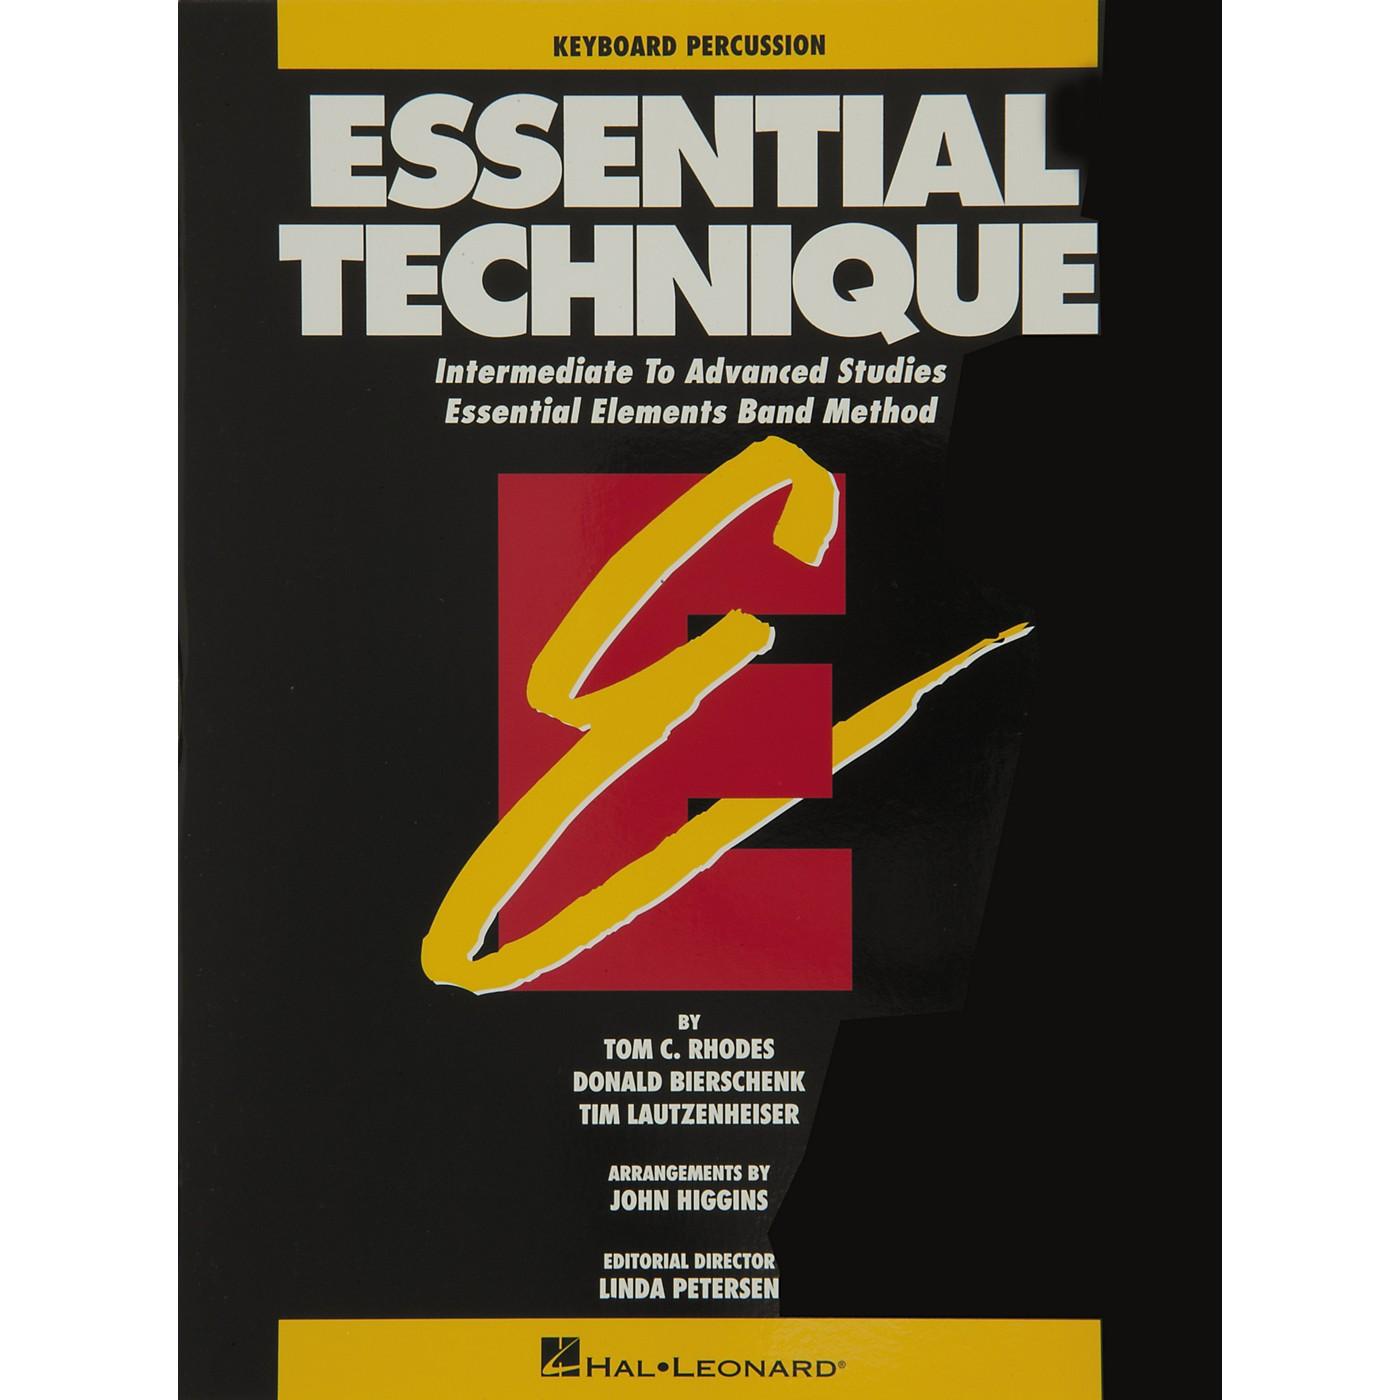 Hal Leonard Essential Technique Keyboard Percussion Intermediate To Advanced Studies thumbnail